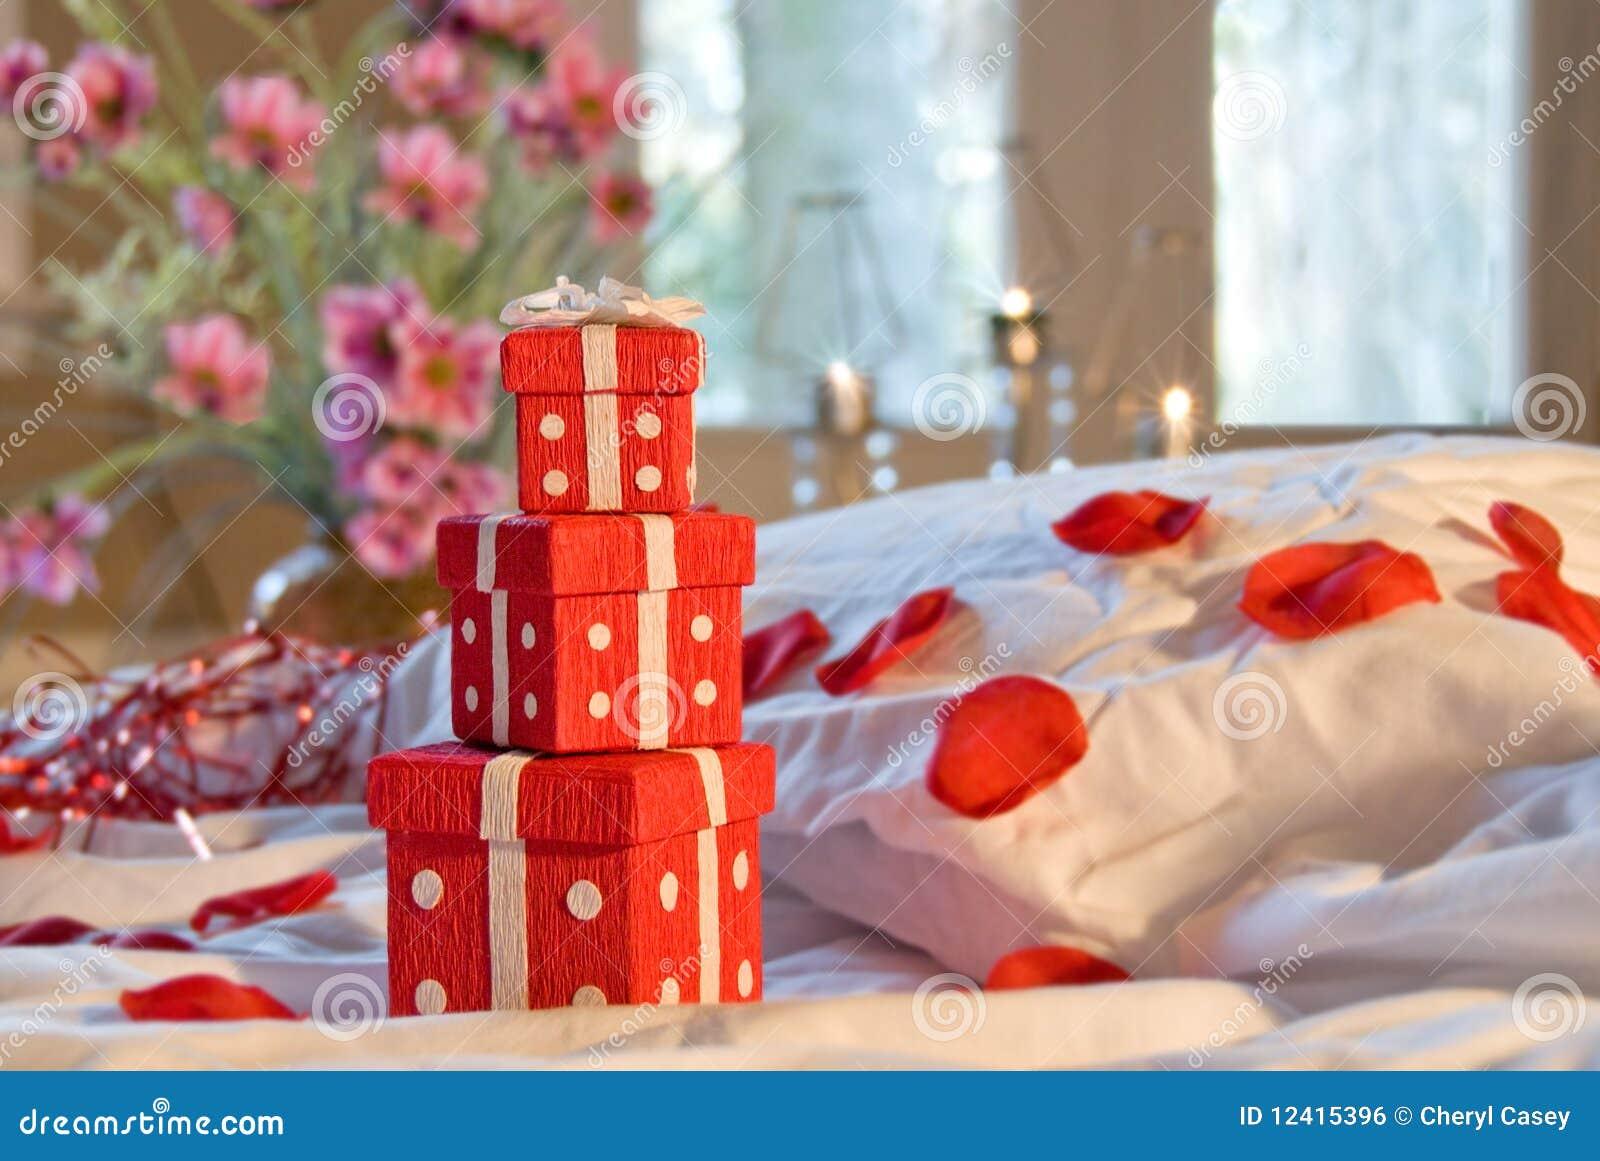 Bedroom romantic scene